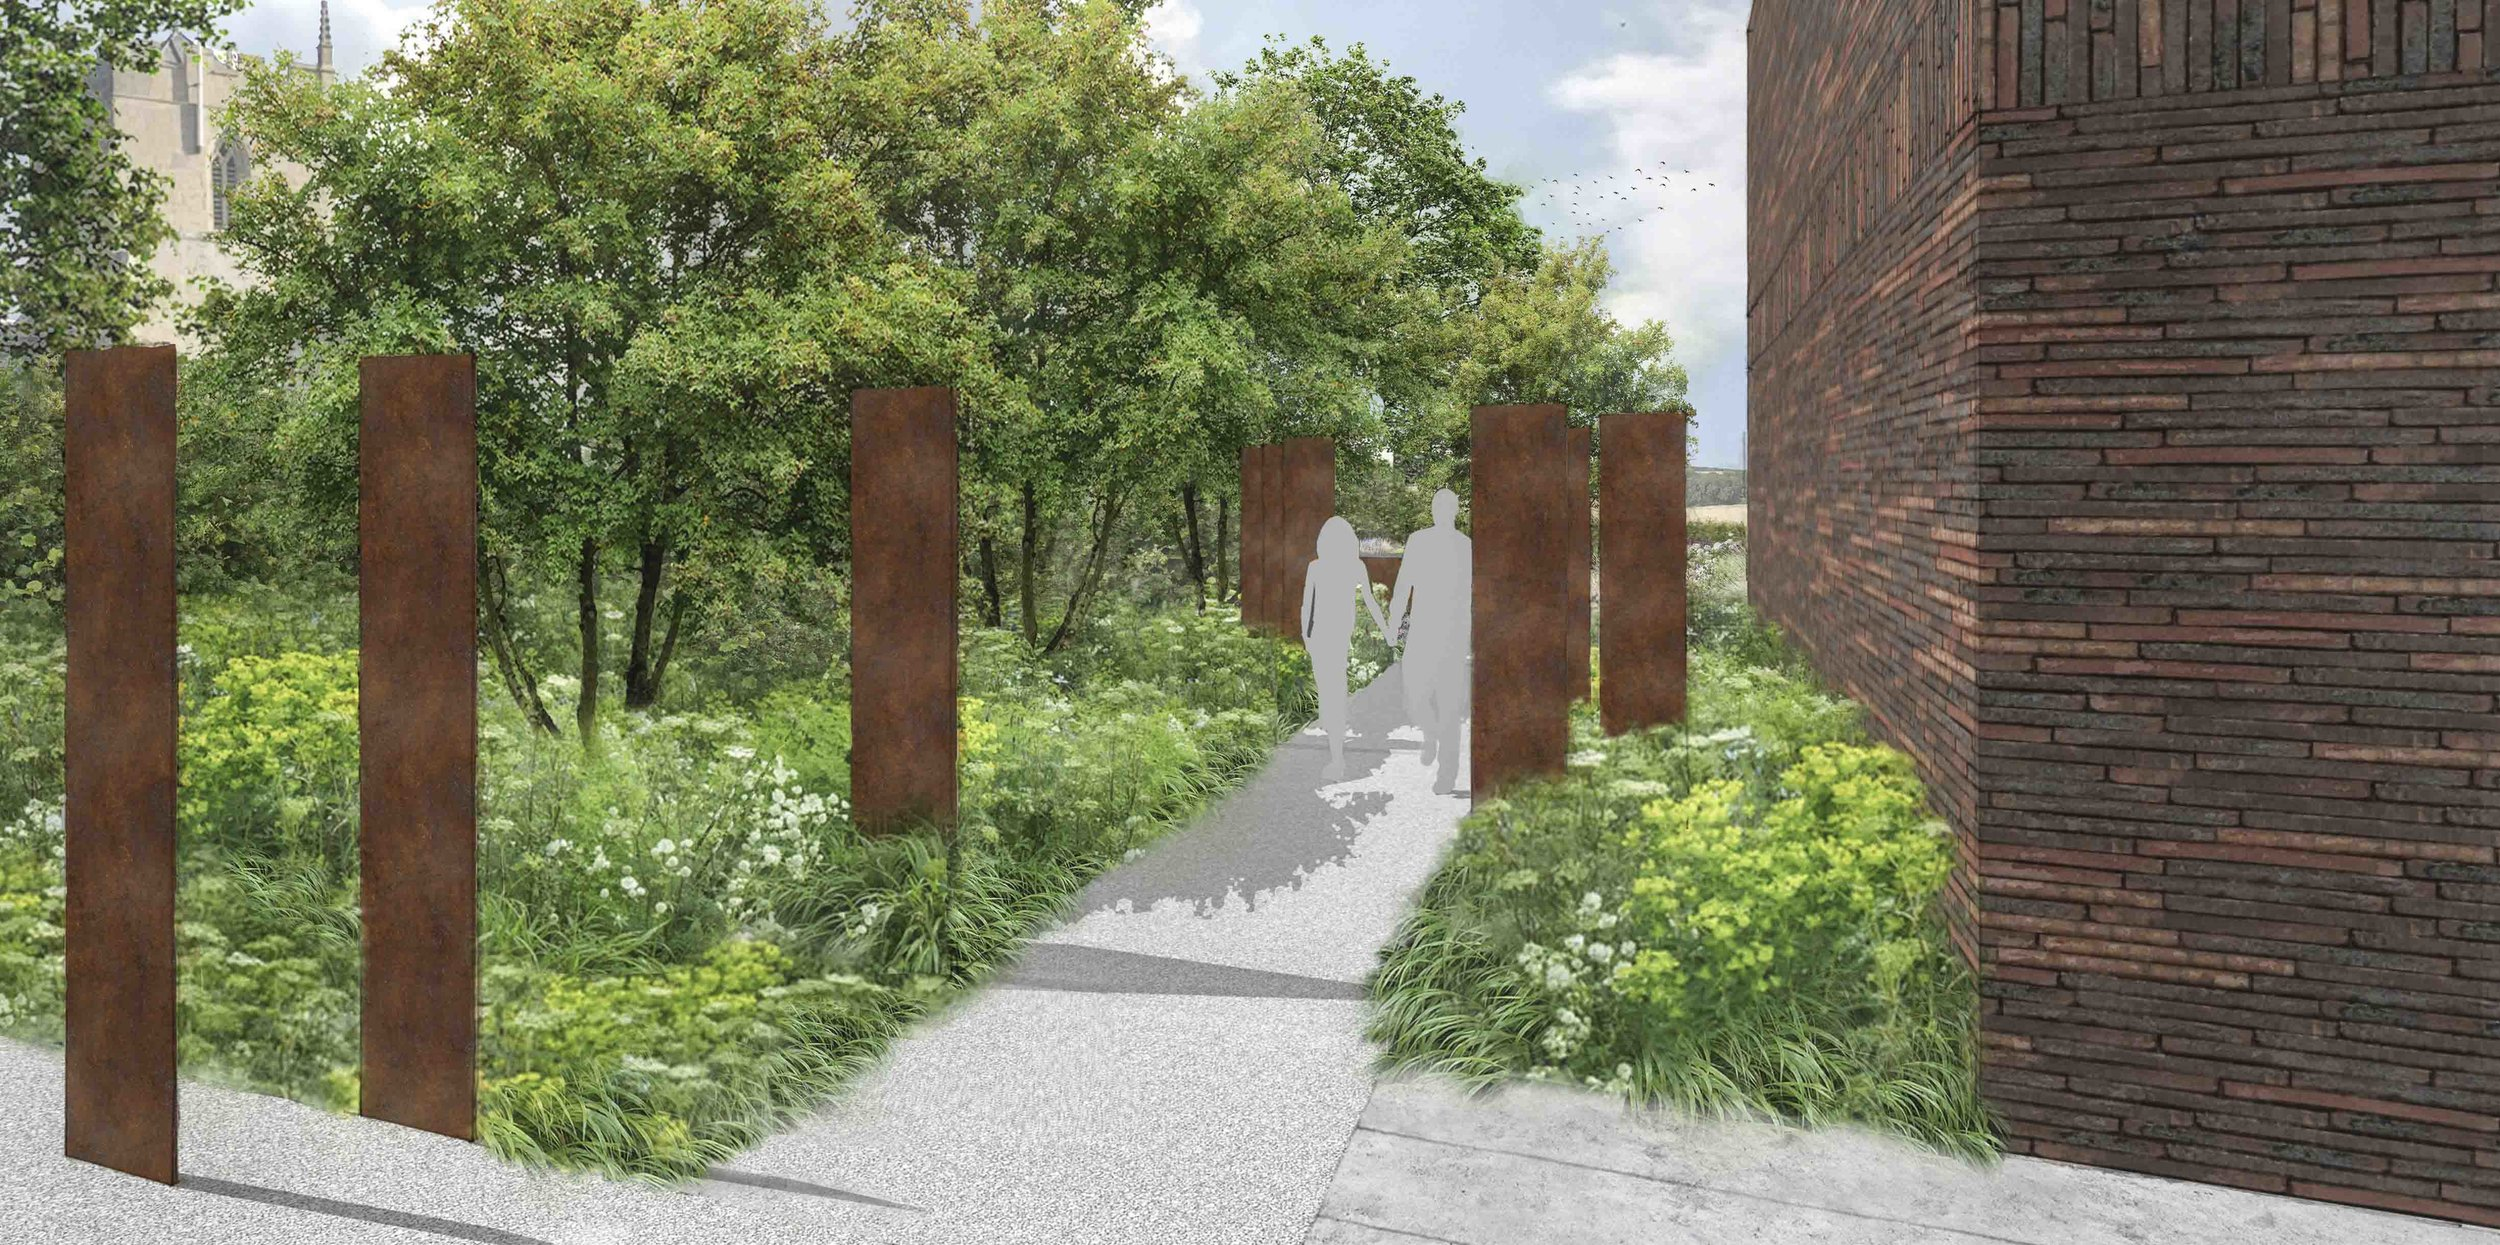 Colm Joseph Gardens - contemporary garden design Cambridge corten sculpture naturalistic planting.jpg